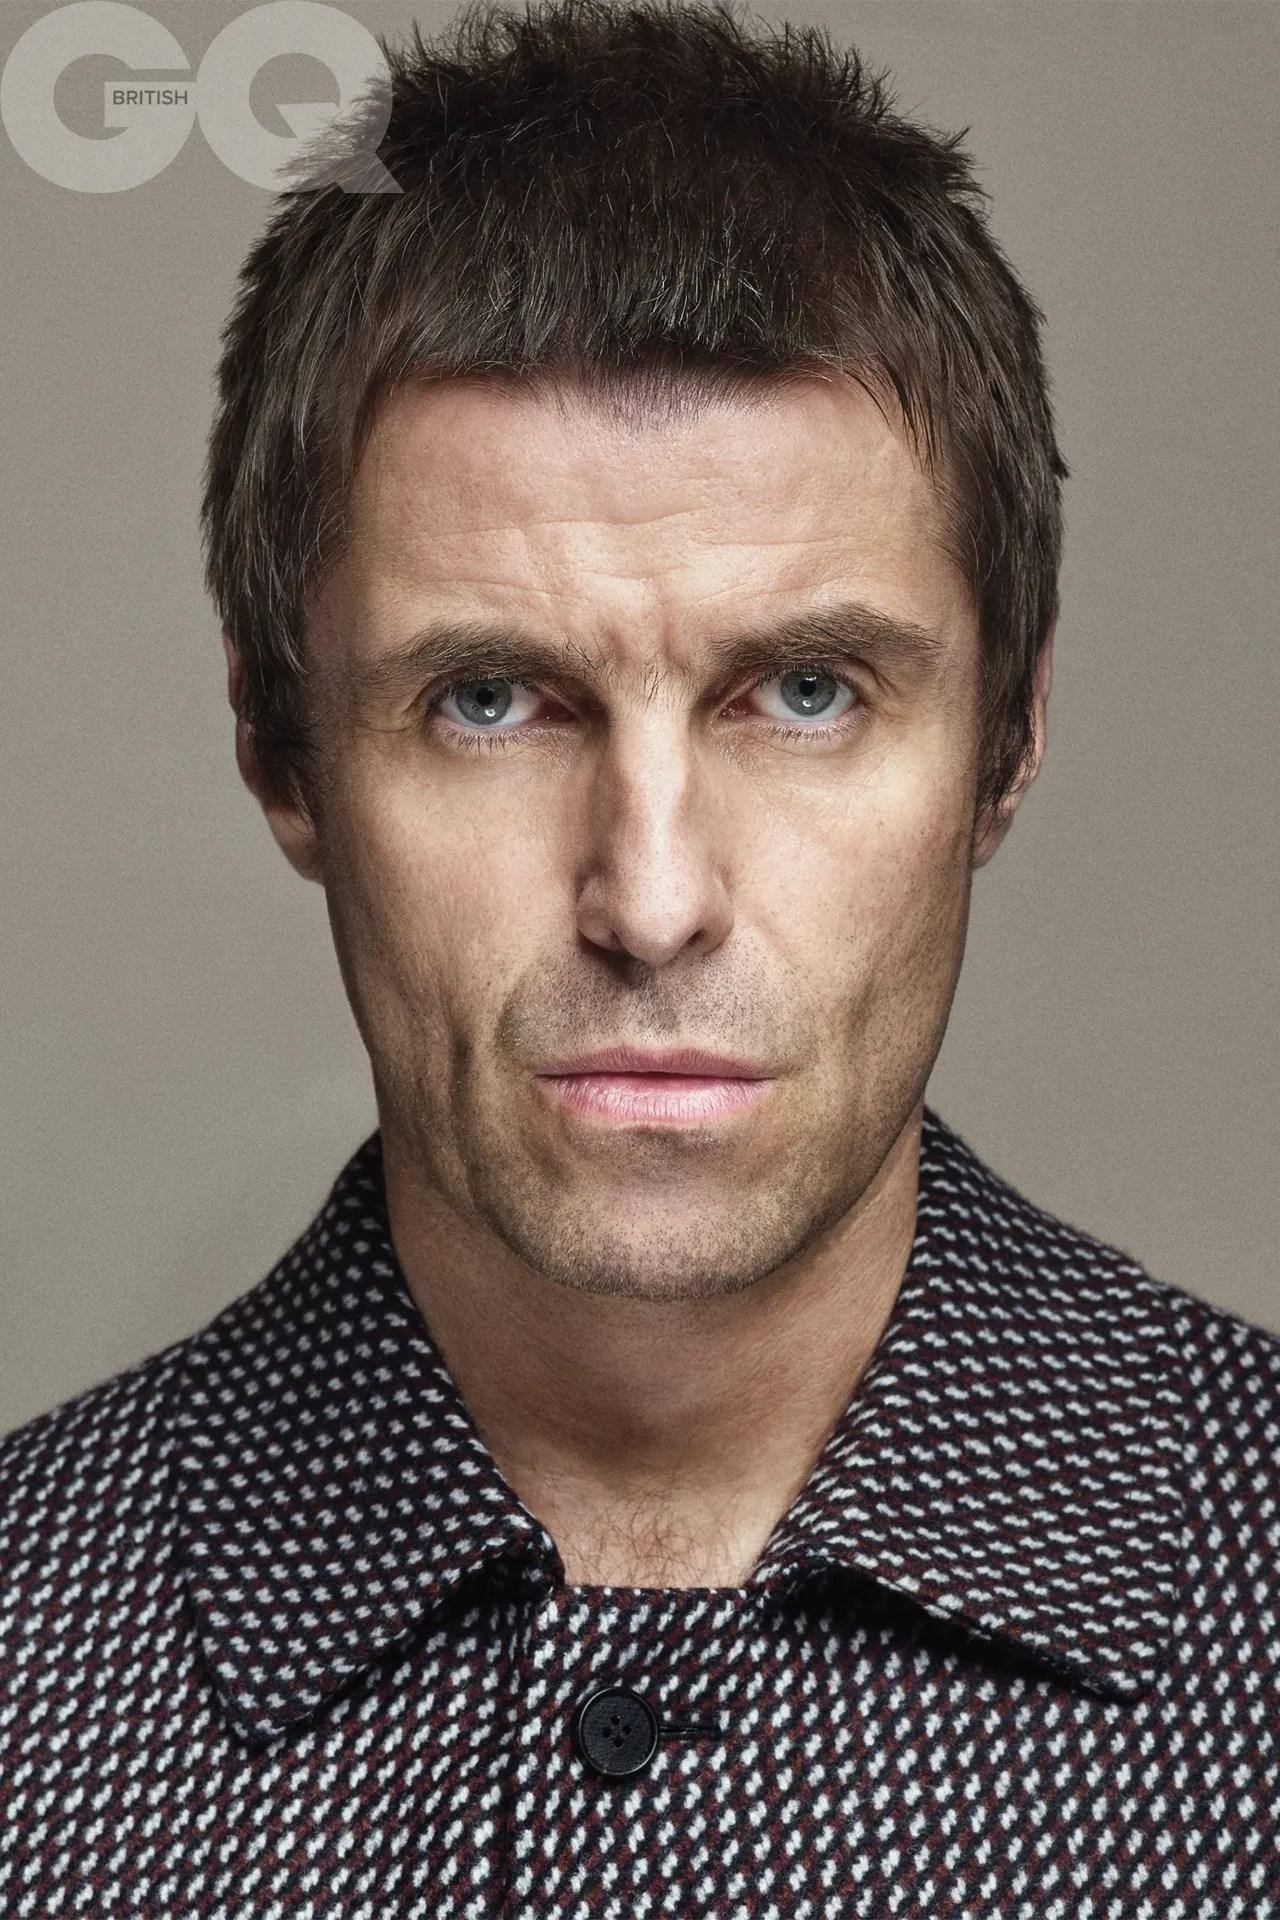 Official website for liam gallagher. Liam Gallagher Haircut 90s - bpatello